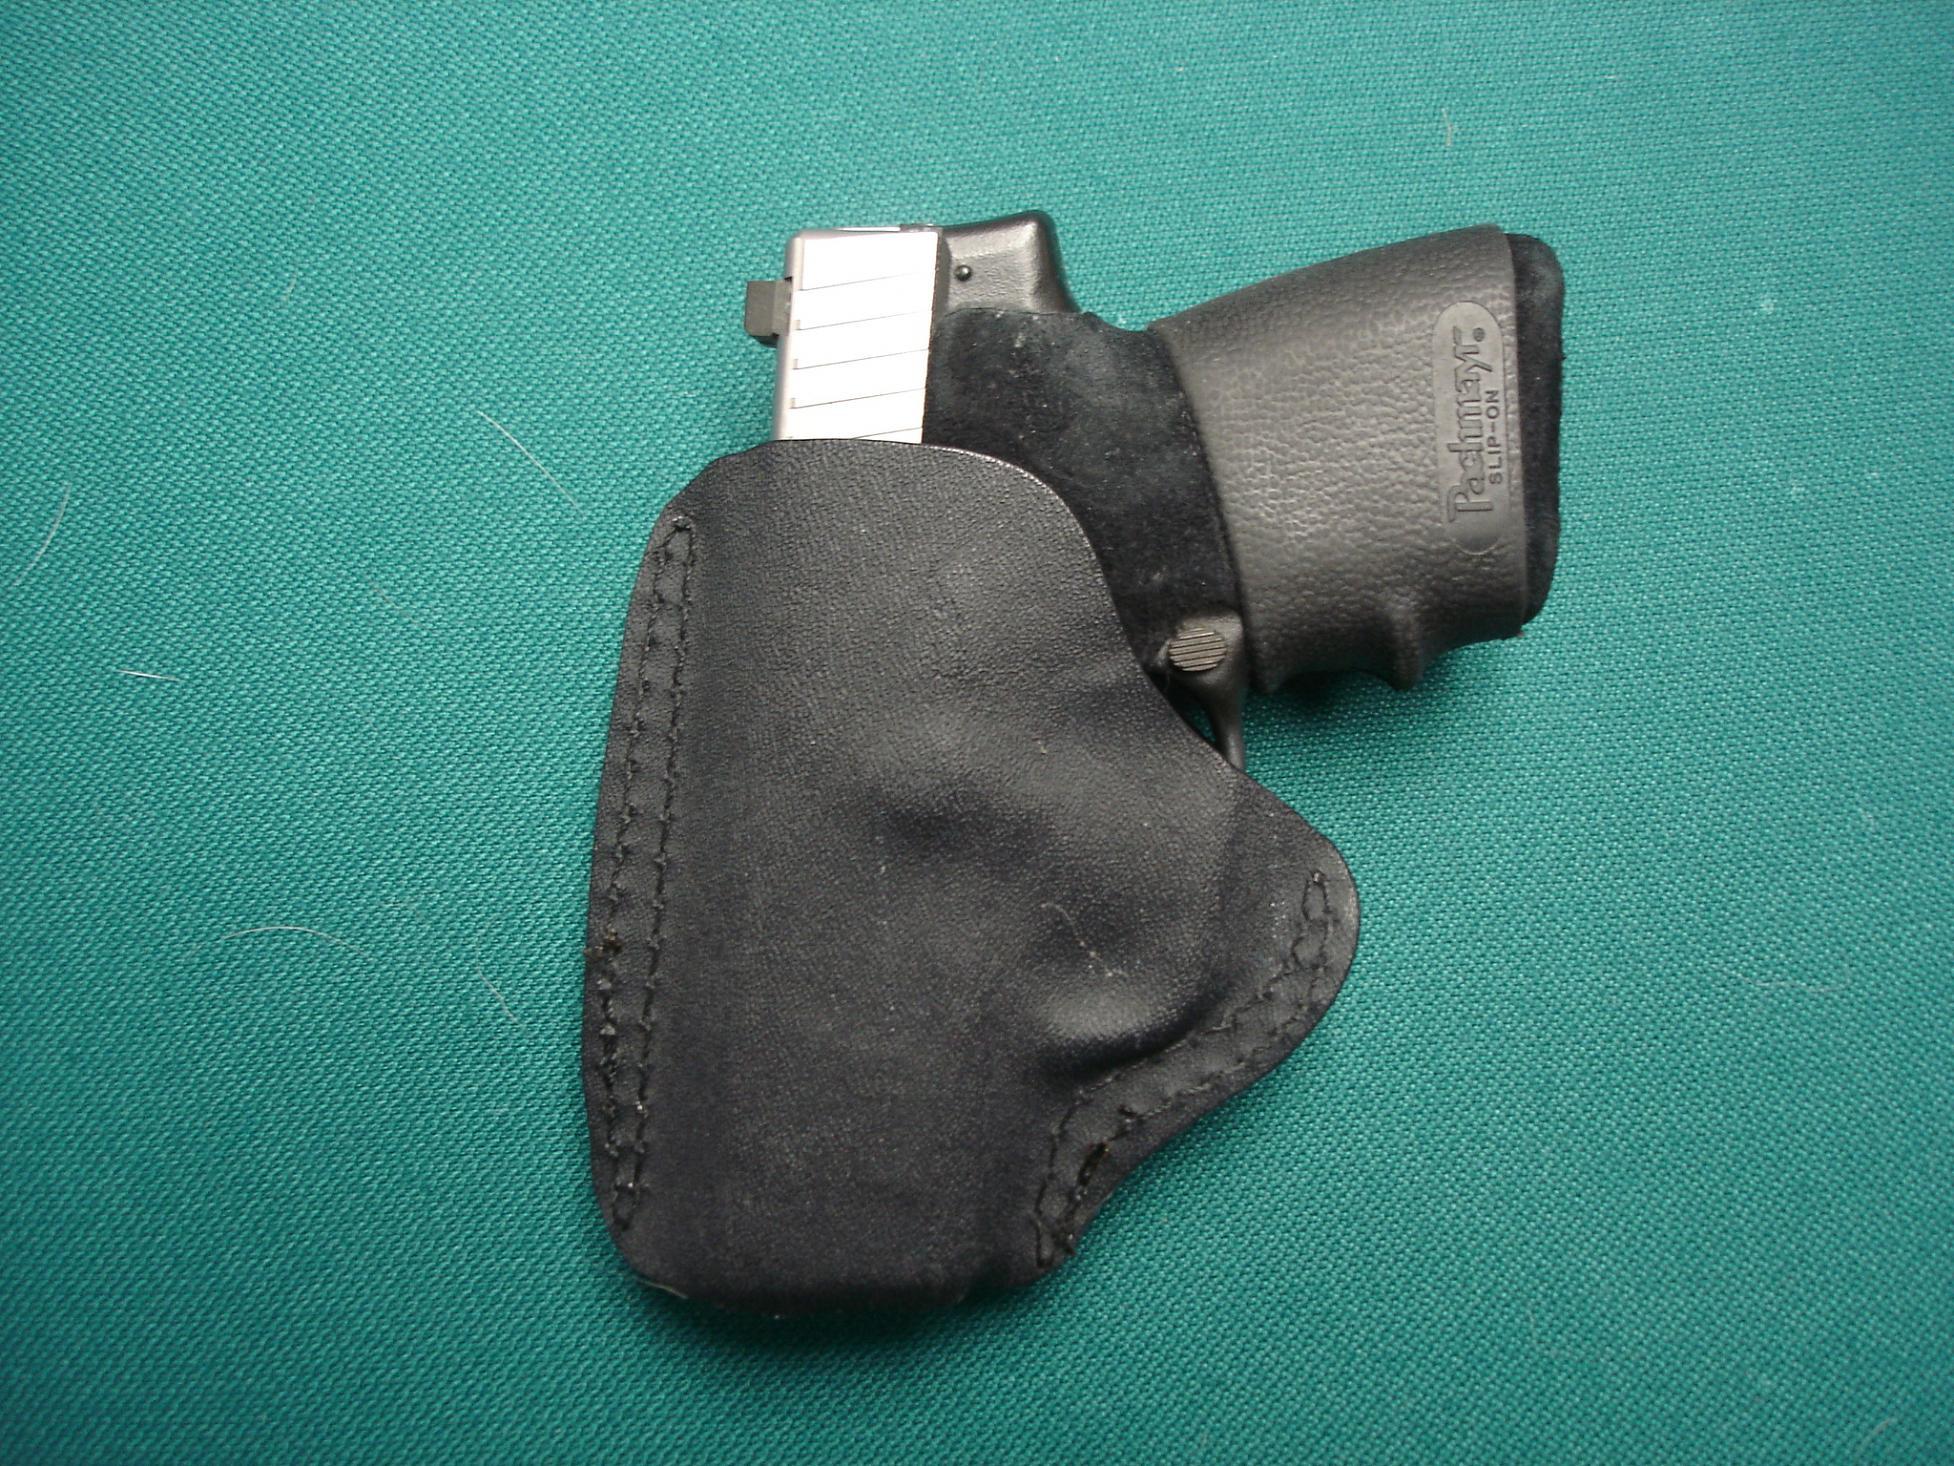 Fist kydex holsters